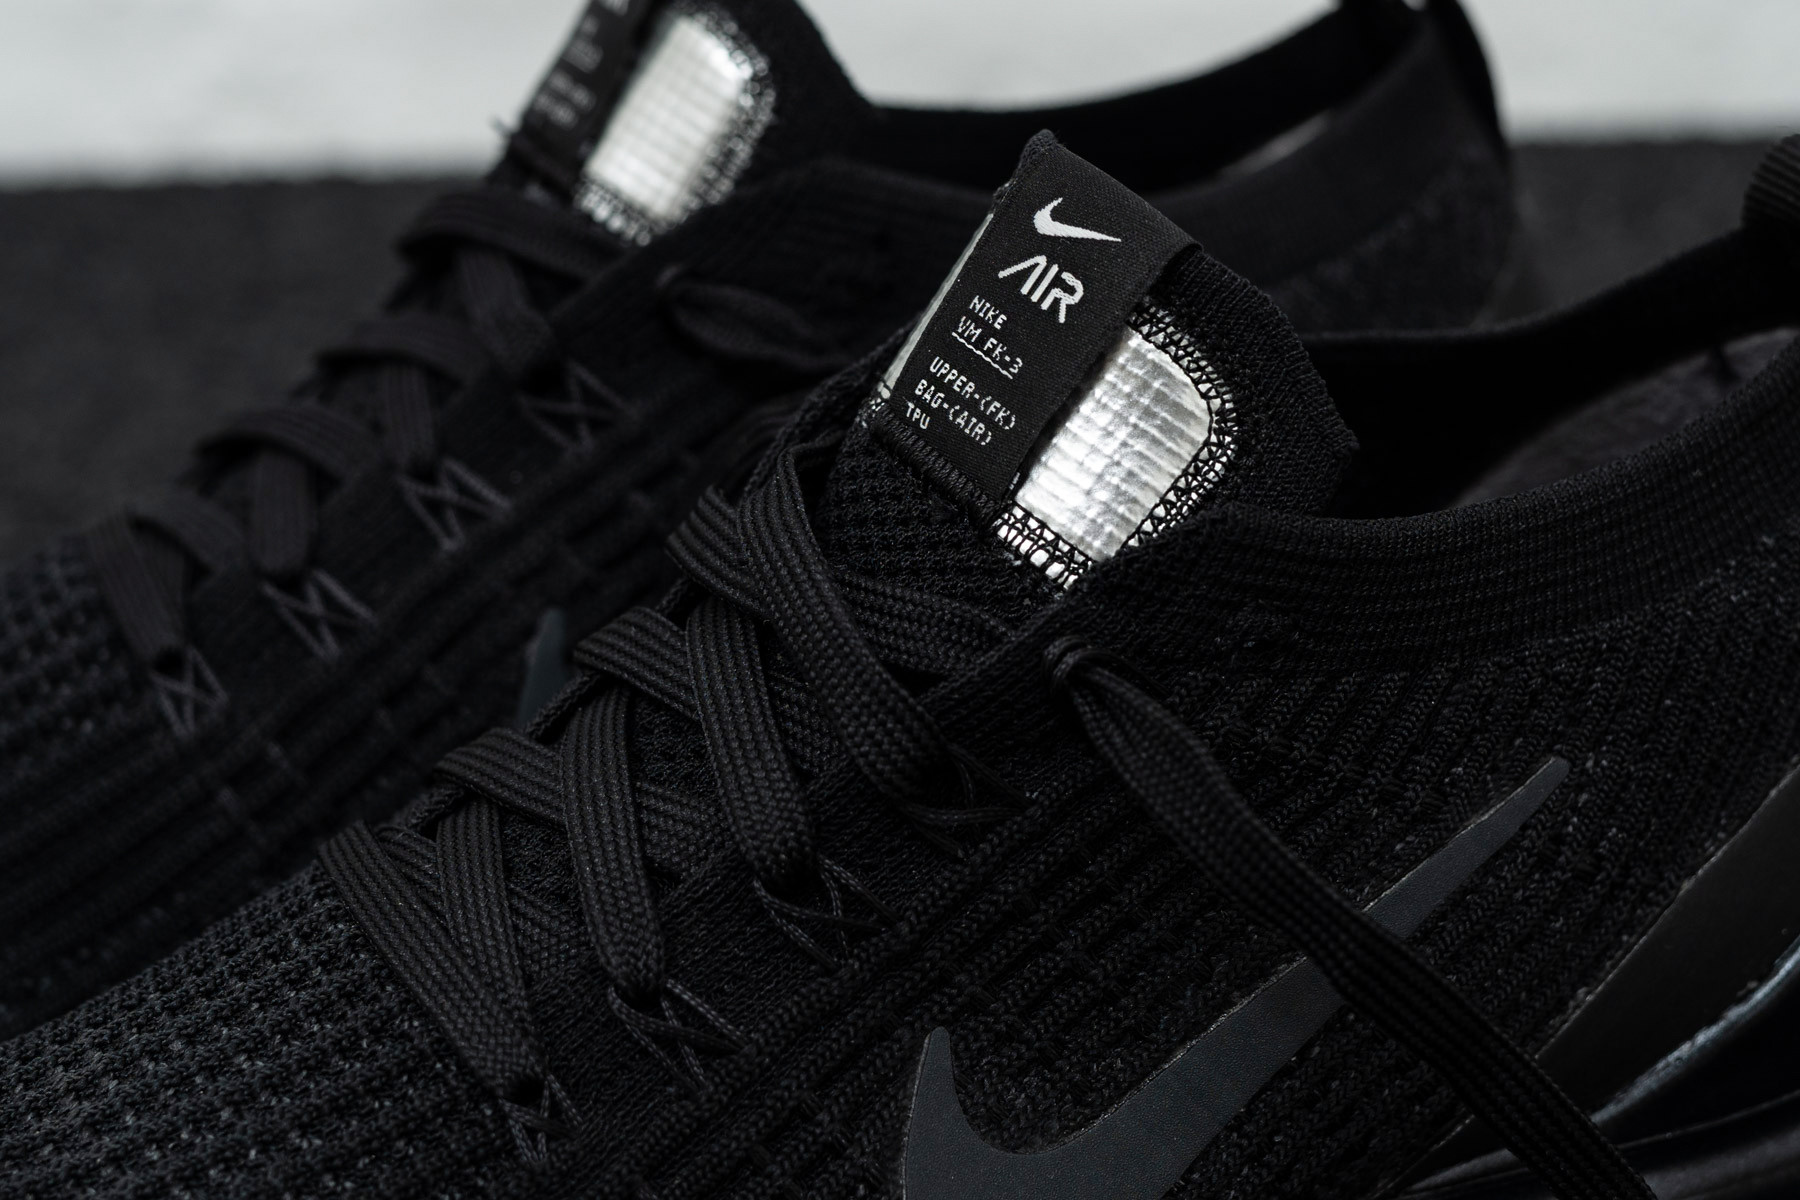 guirnalda Emborracharse Turista  Nike Air Vapormax Flyknit 3 | Nyheter fra Nike finner du hos SKILLS -  Sneaker.no - Sneaker.no